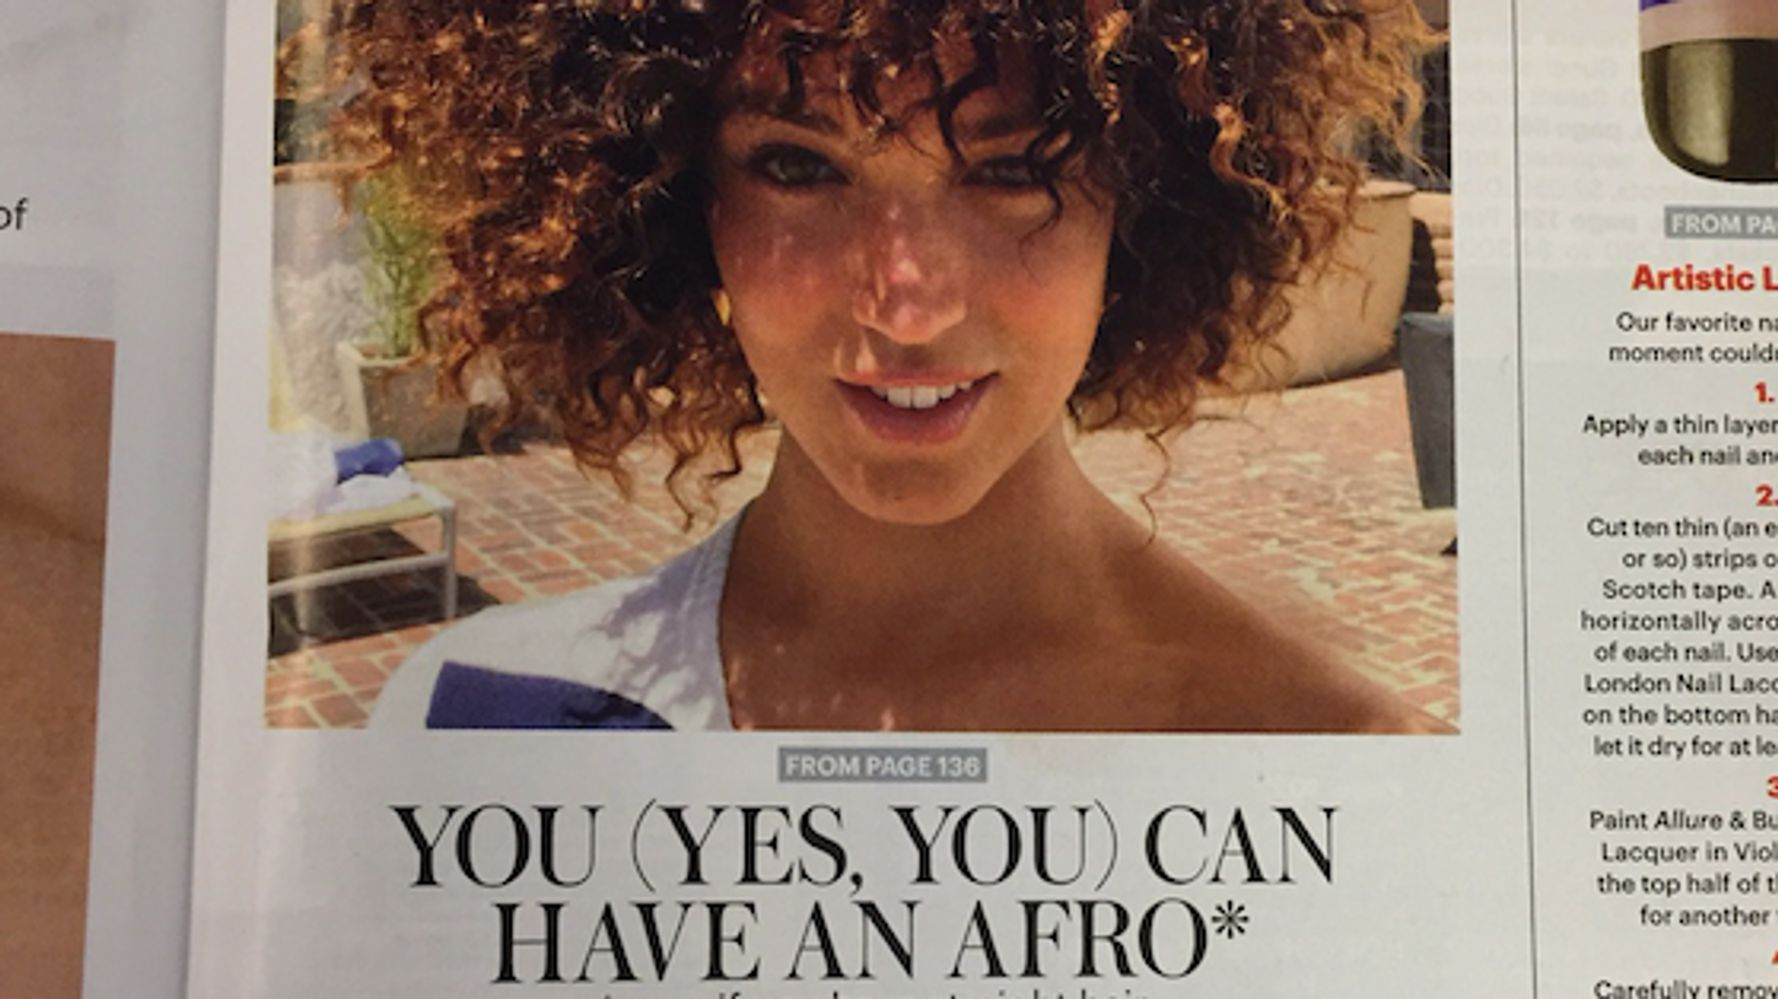 Afro white girl 'Don't wear